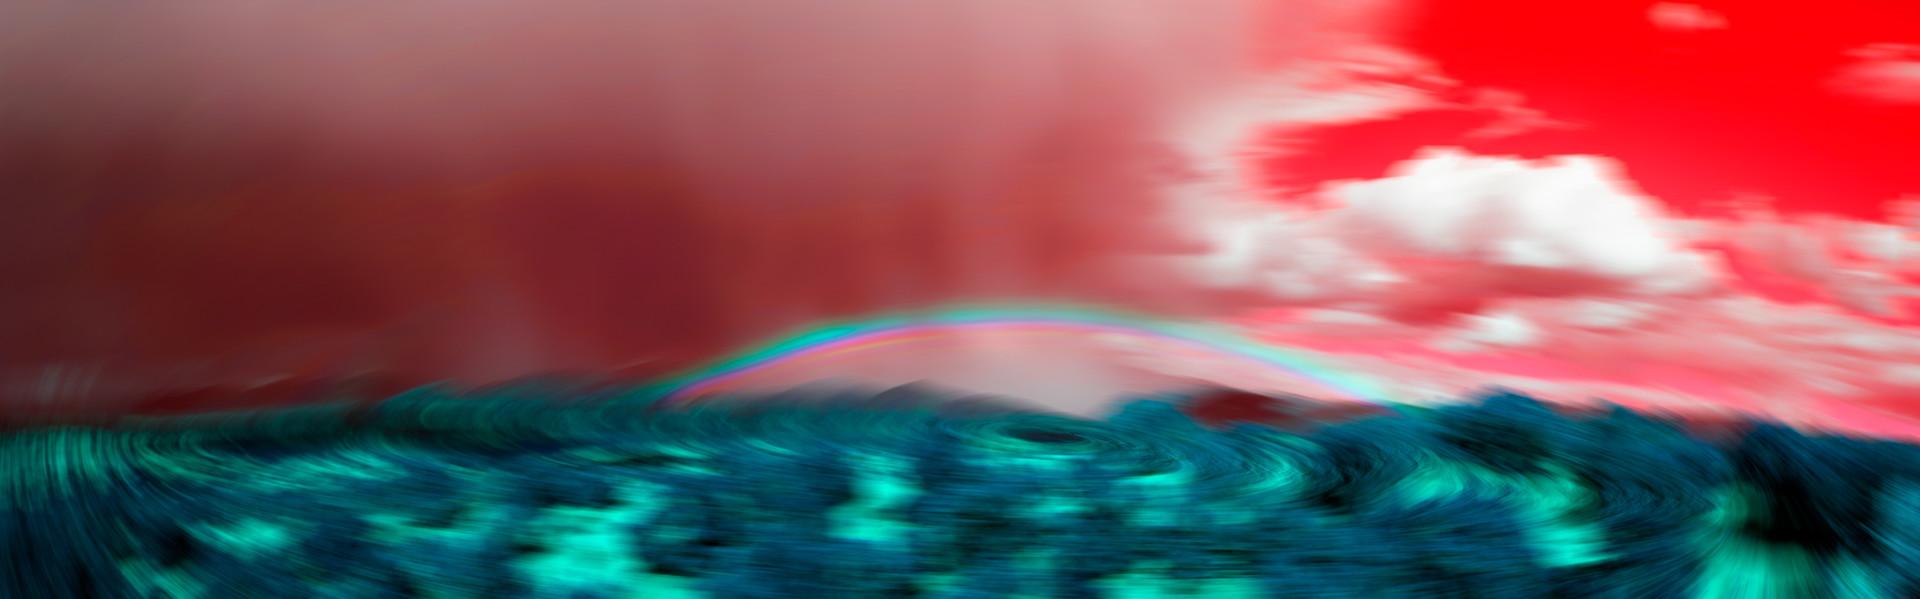 Rainbows Art 3